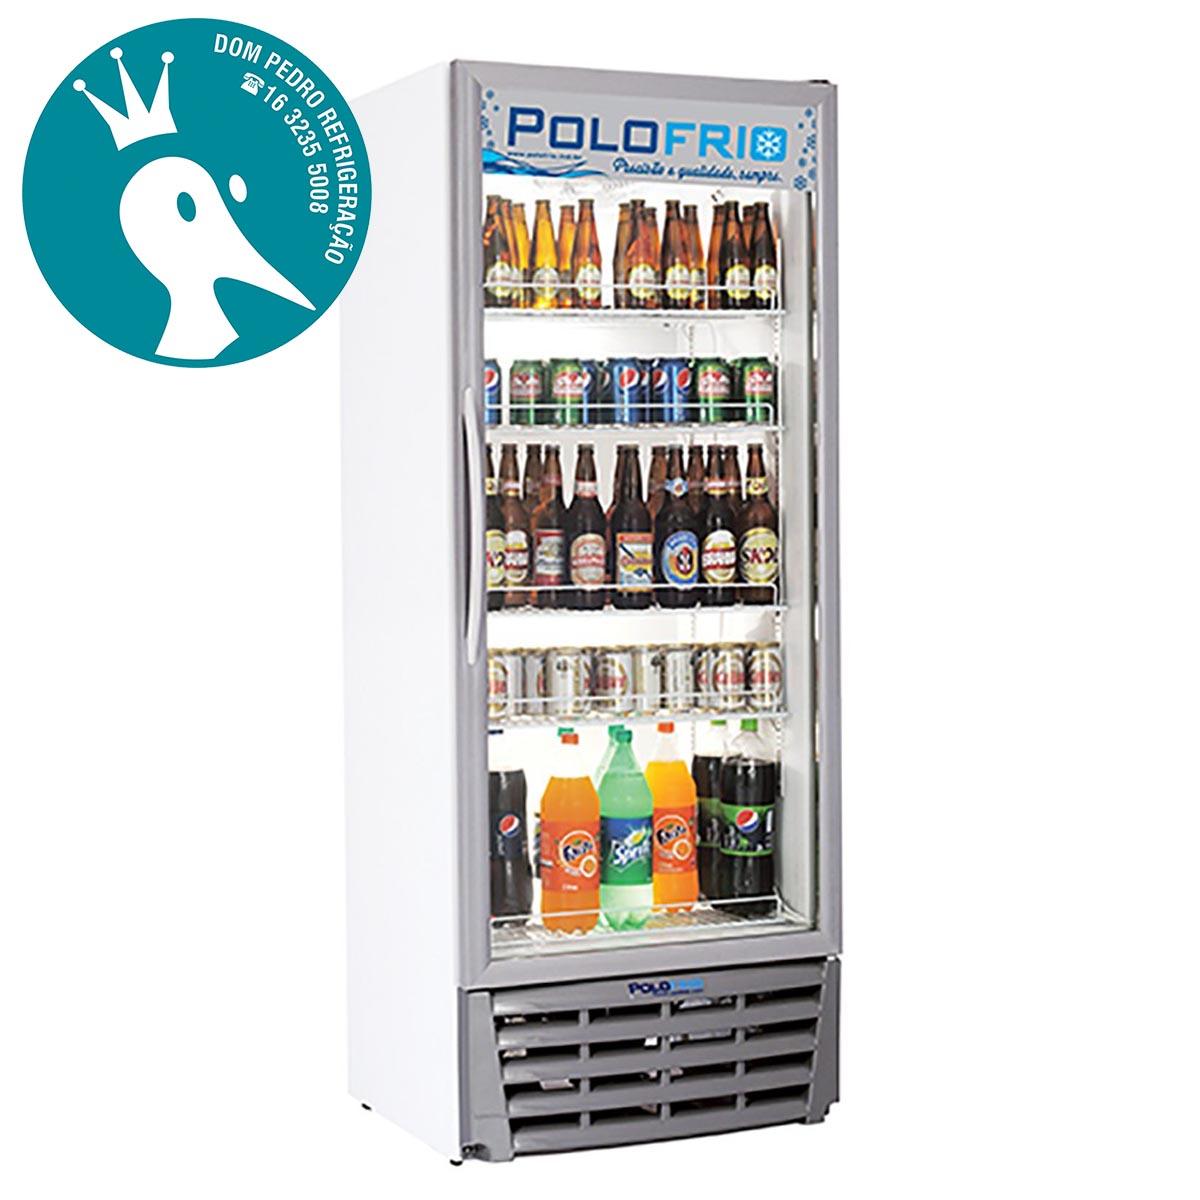 Geladeira Visa Cooler 450L Porta de Vidro Duplo - Polofrio